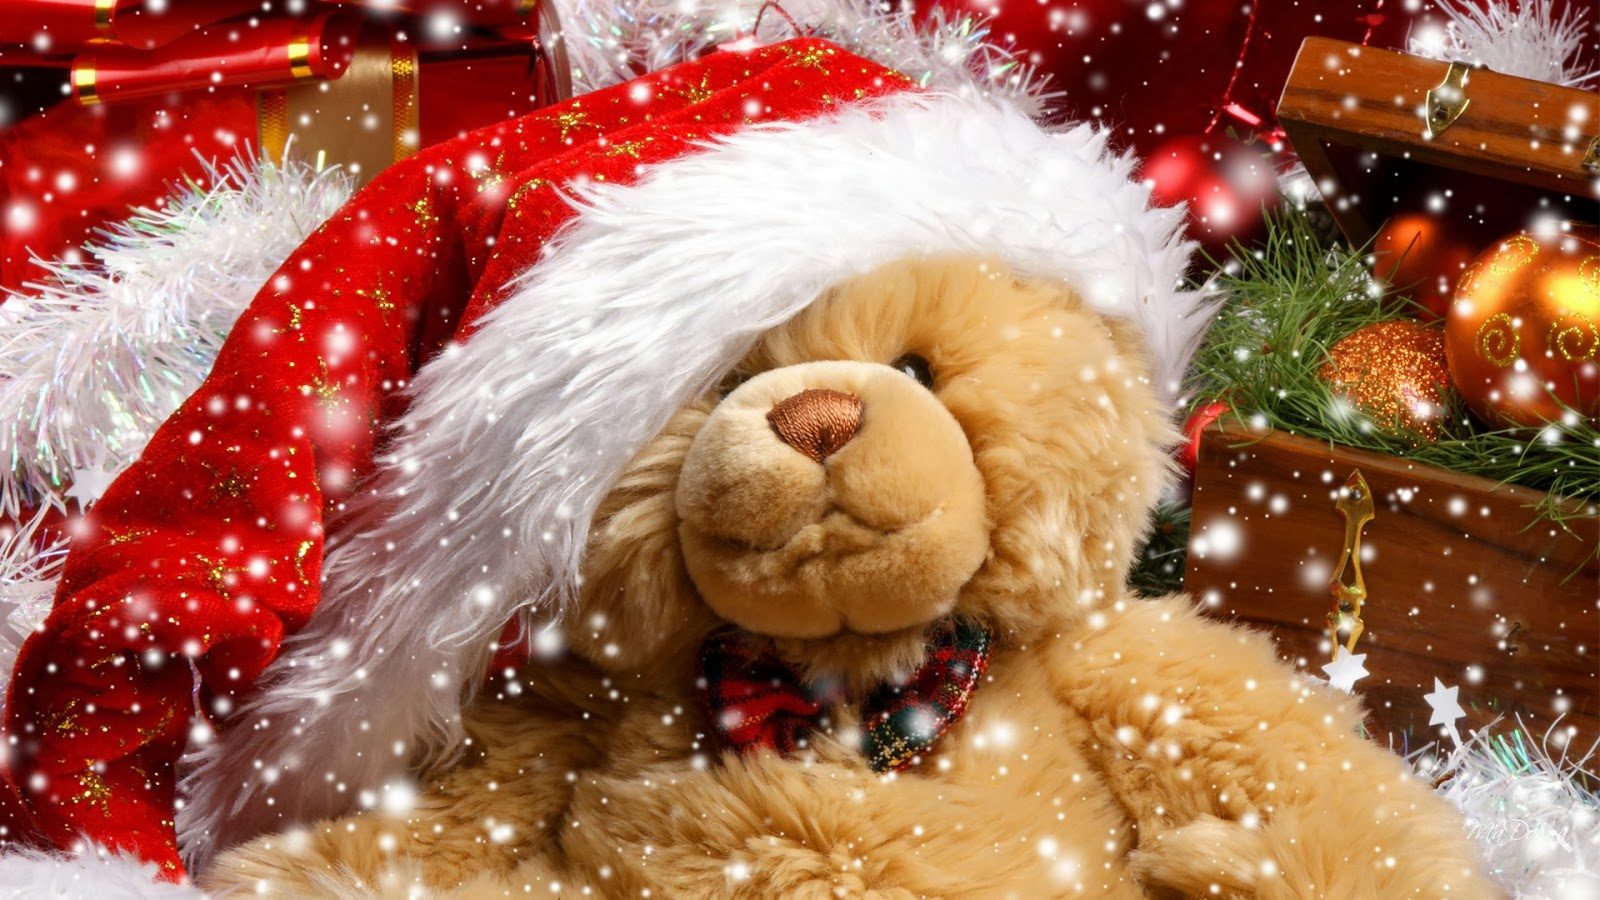 Cute Dog Wallpapers With Quotes صور دباديب حب حمراء وبيضاء احلي صور دبدوب سوبر كايرو